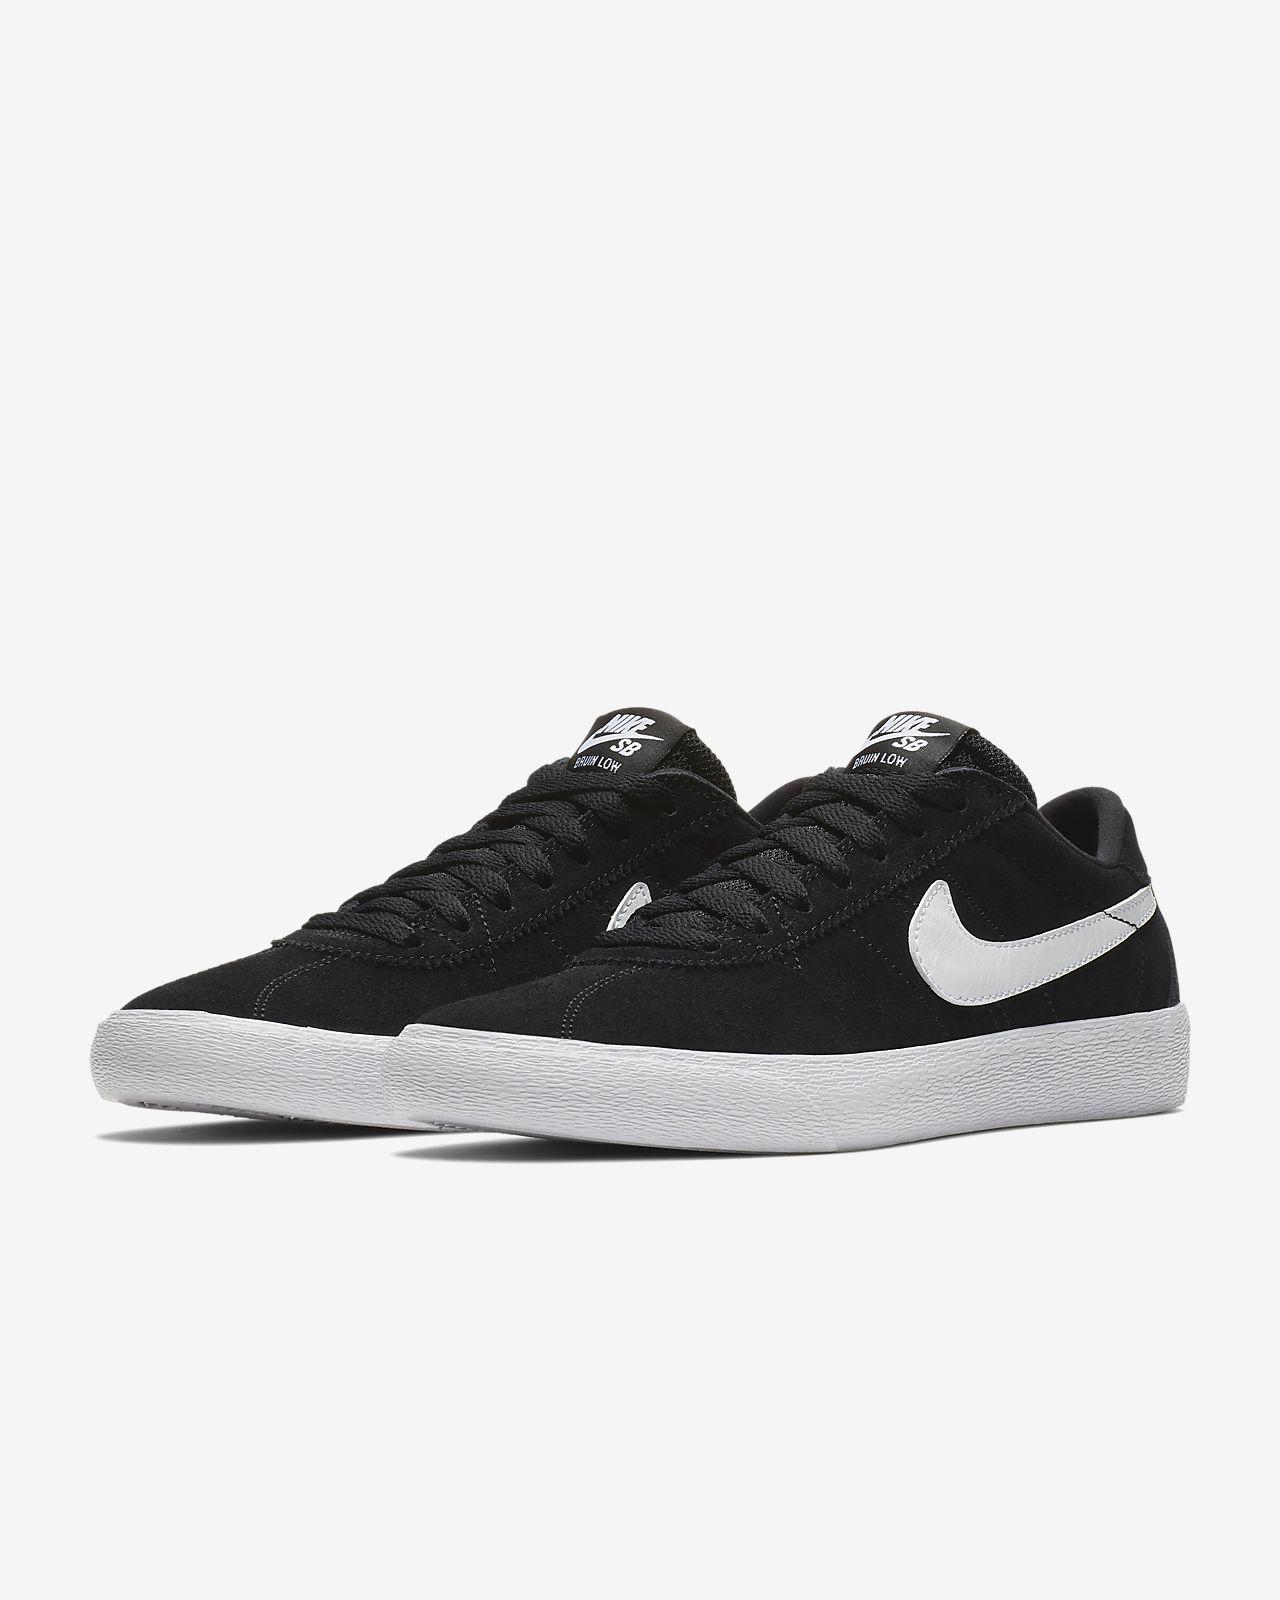 new arrival 312d8 3af1a ... Nike SB Zoom Bruin Low Womens Skateboarding Shoe